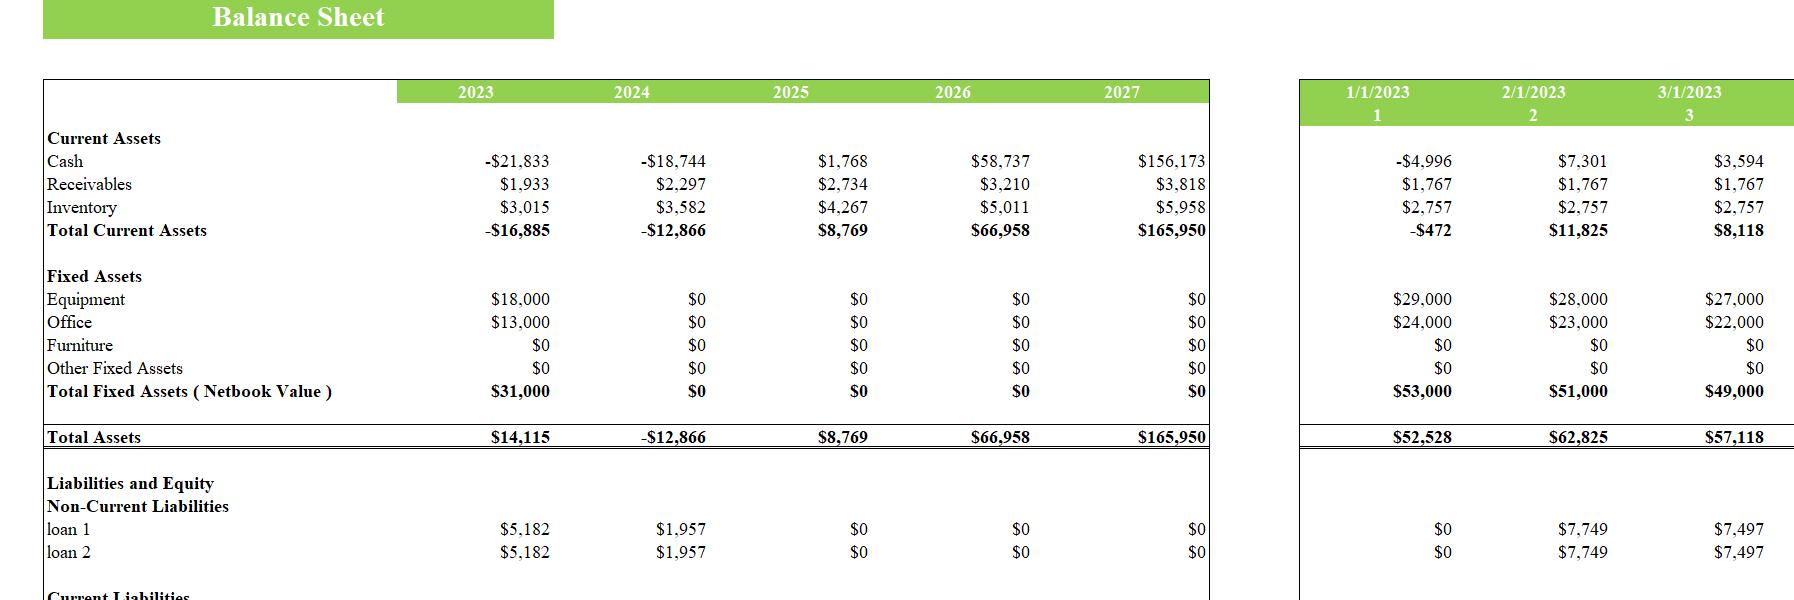 Kiosks Financial Model Balance Sheet